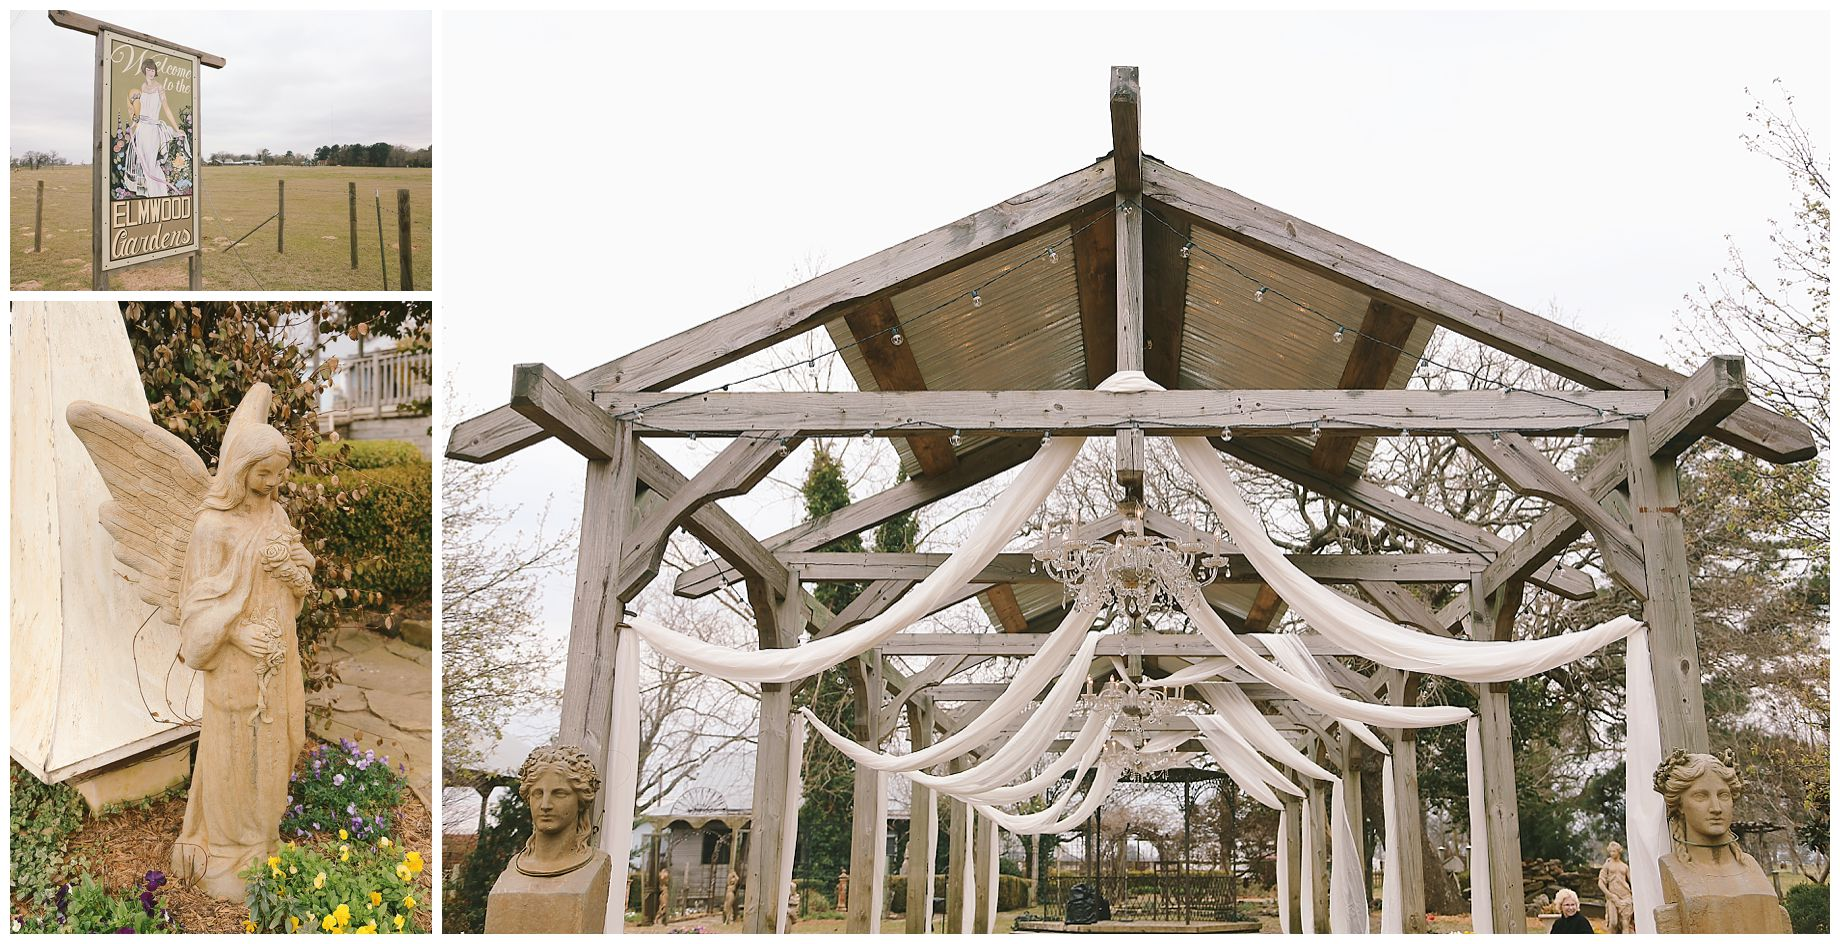 elmwood-gardens-wedding-photos-01